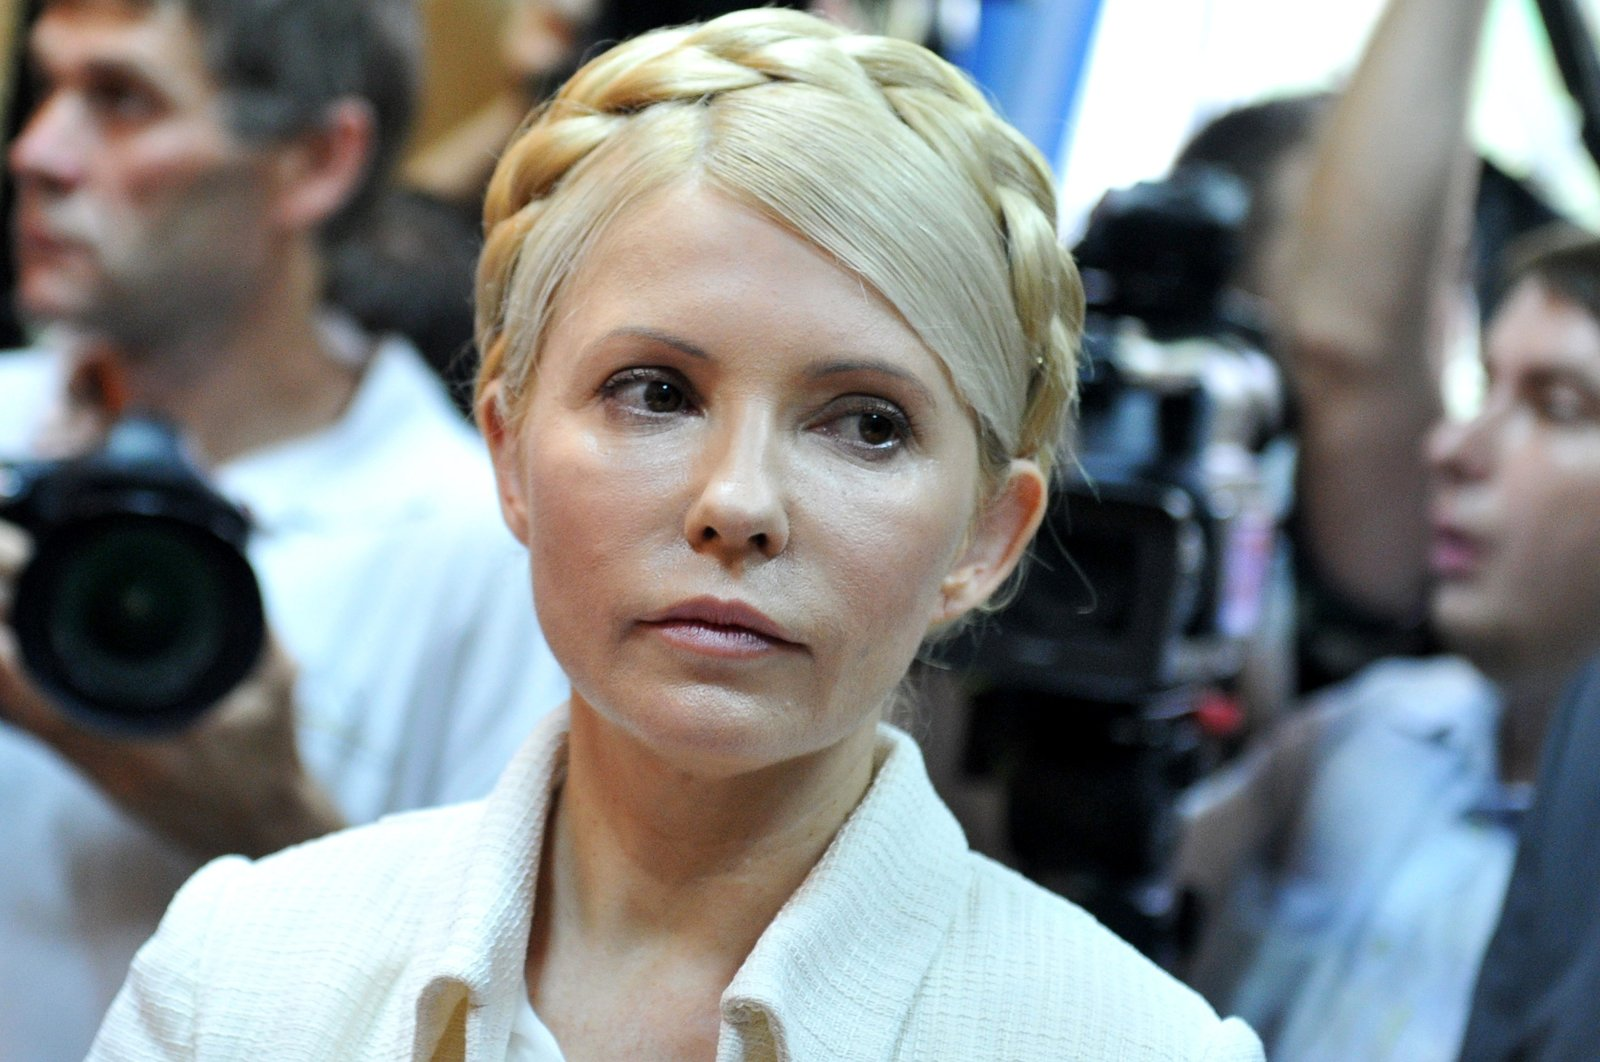 In this photograph taken on June 24, 2011 Ukraine's ex-prime minister Yulia Tymoshenko looks on at the beginning her court hearing in Kiev. (AFP Photo)